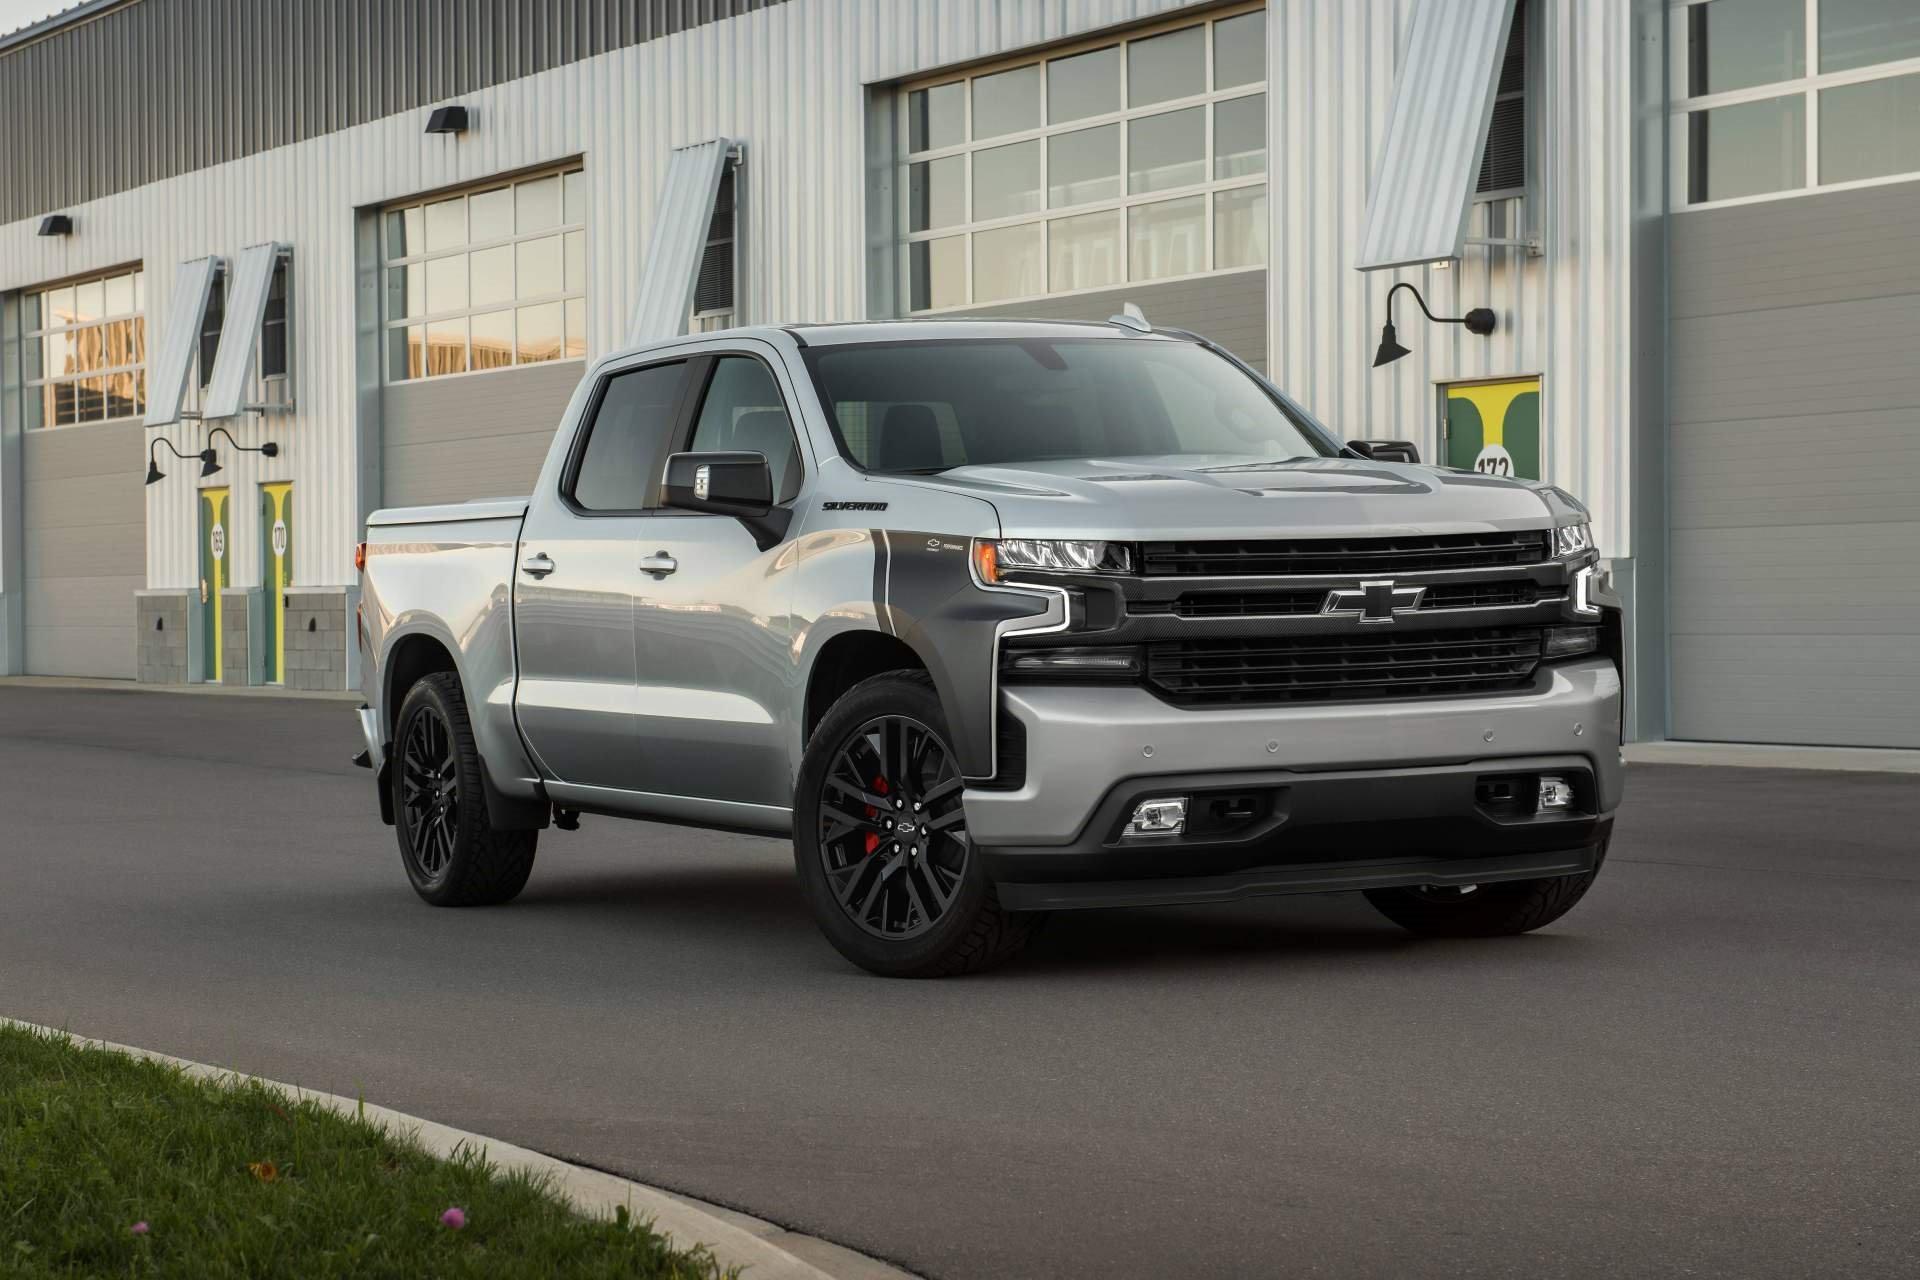 New 2019 Chevrolet-Silverado 2500HD High Country Silverado 2500HD High Country for sale $59,000 at M and V Leasing in Brooklyn NY 11223 1